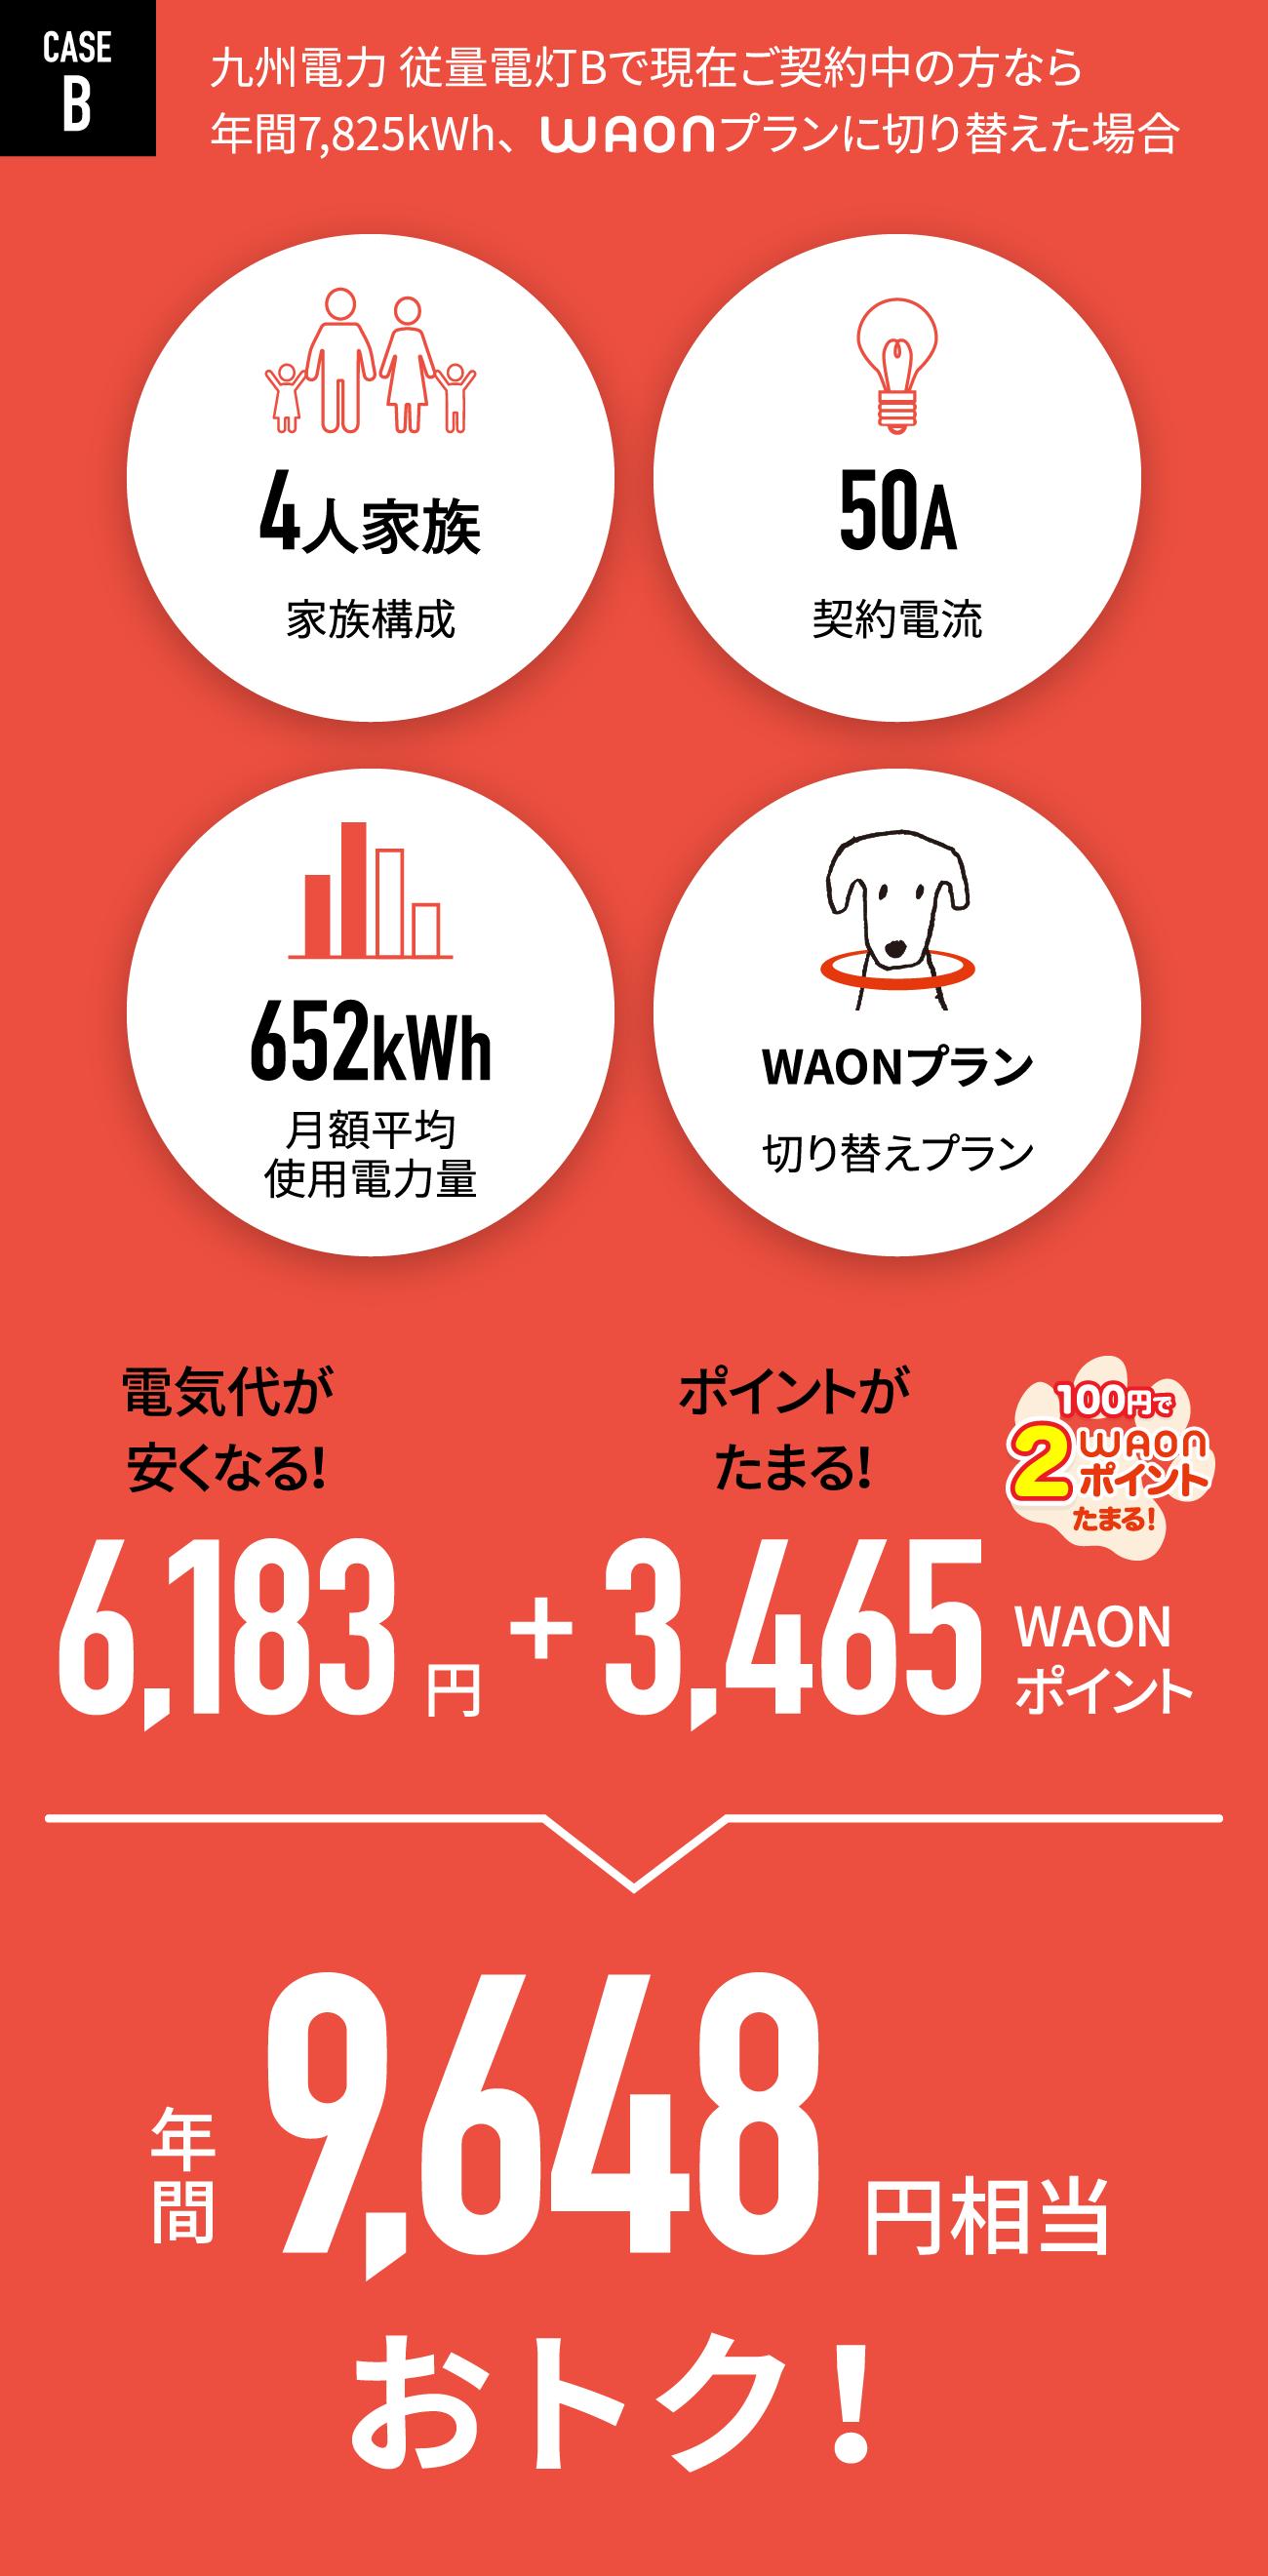 CASE B:九州電力 従量電灯Bで現在ご契約中の方なら、年間7,825kWh、WAONプランに切り替えた場合、年間9,648円相当おトク!